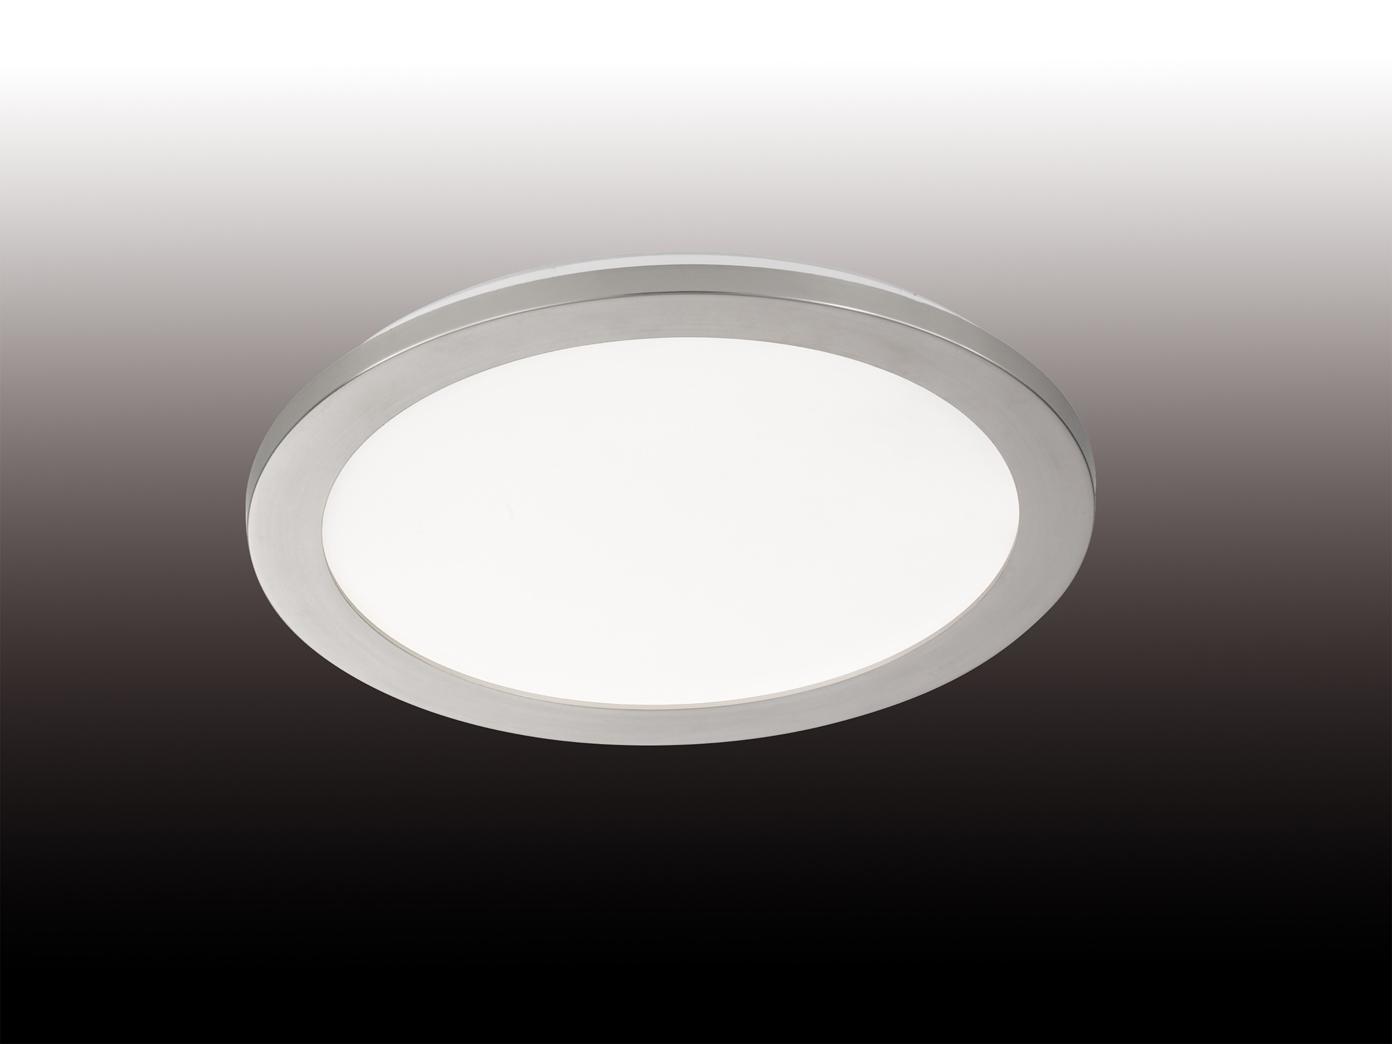 dimmbare led deckenleuchte aus acrylglas nickel ip44. Black Bedroom Furniture Sets. Home Design Ideas